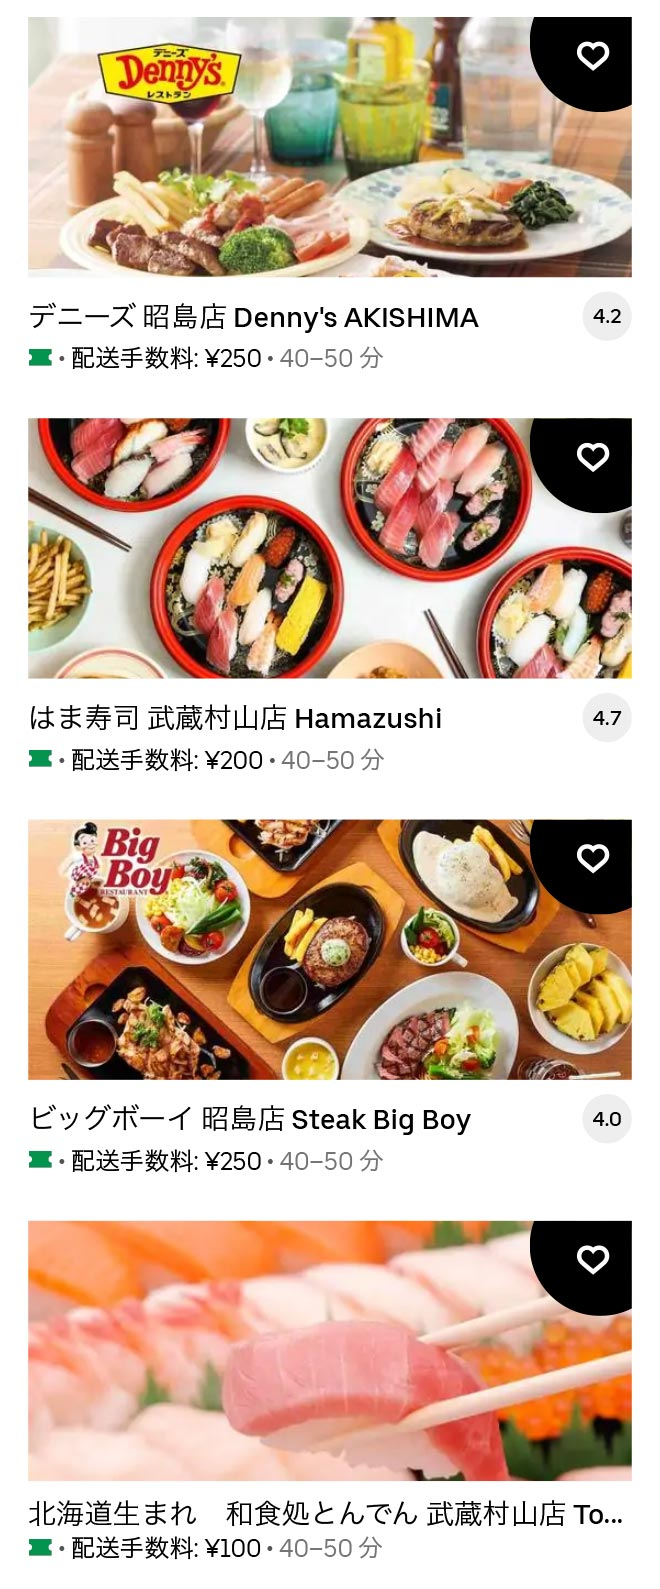 U musashi murayama 2106 09